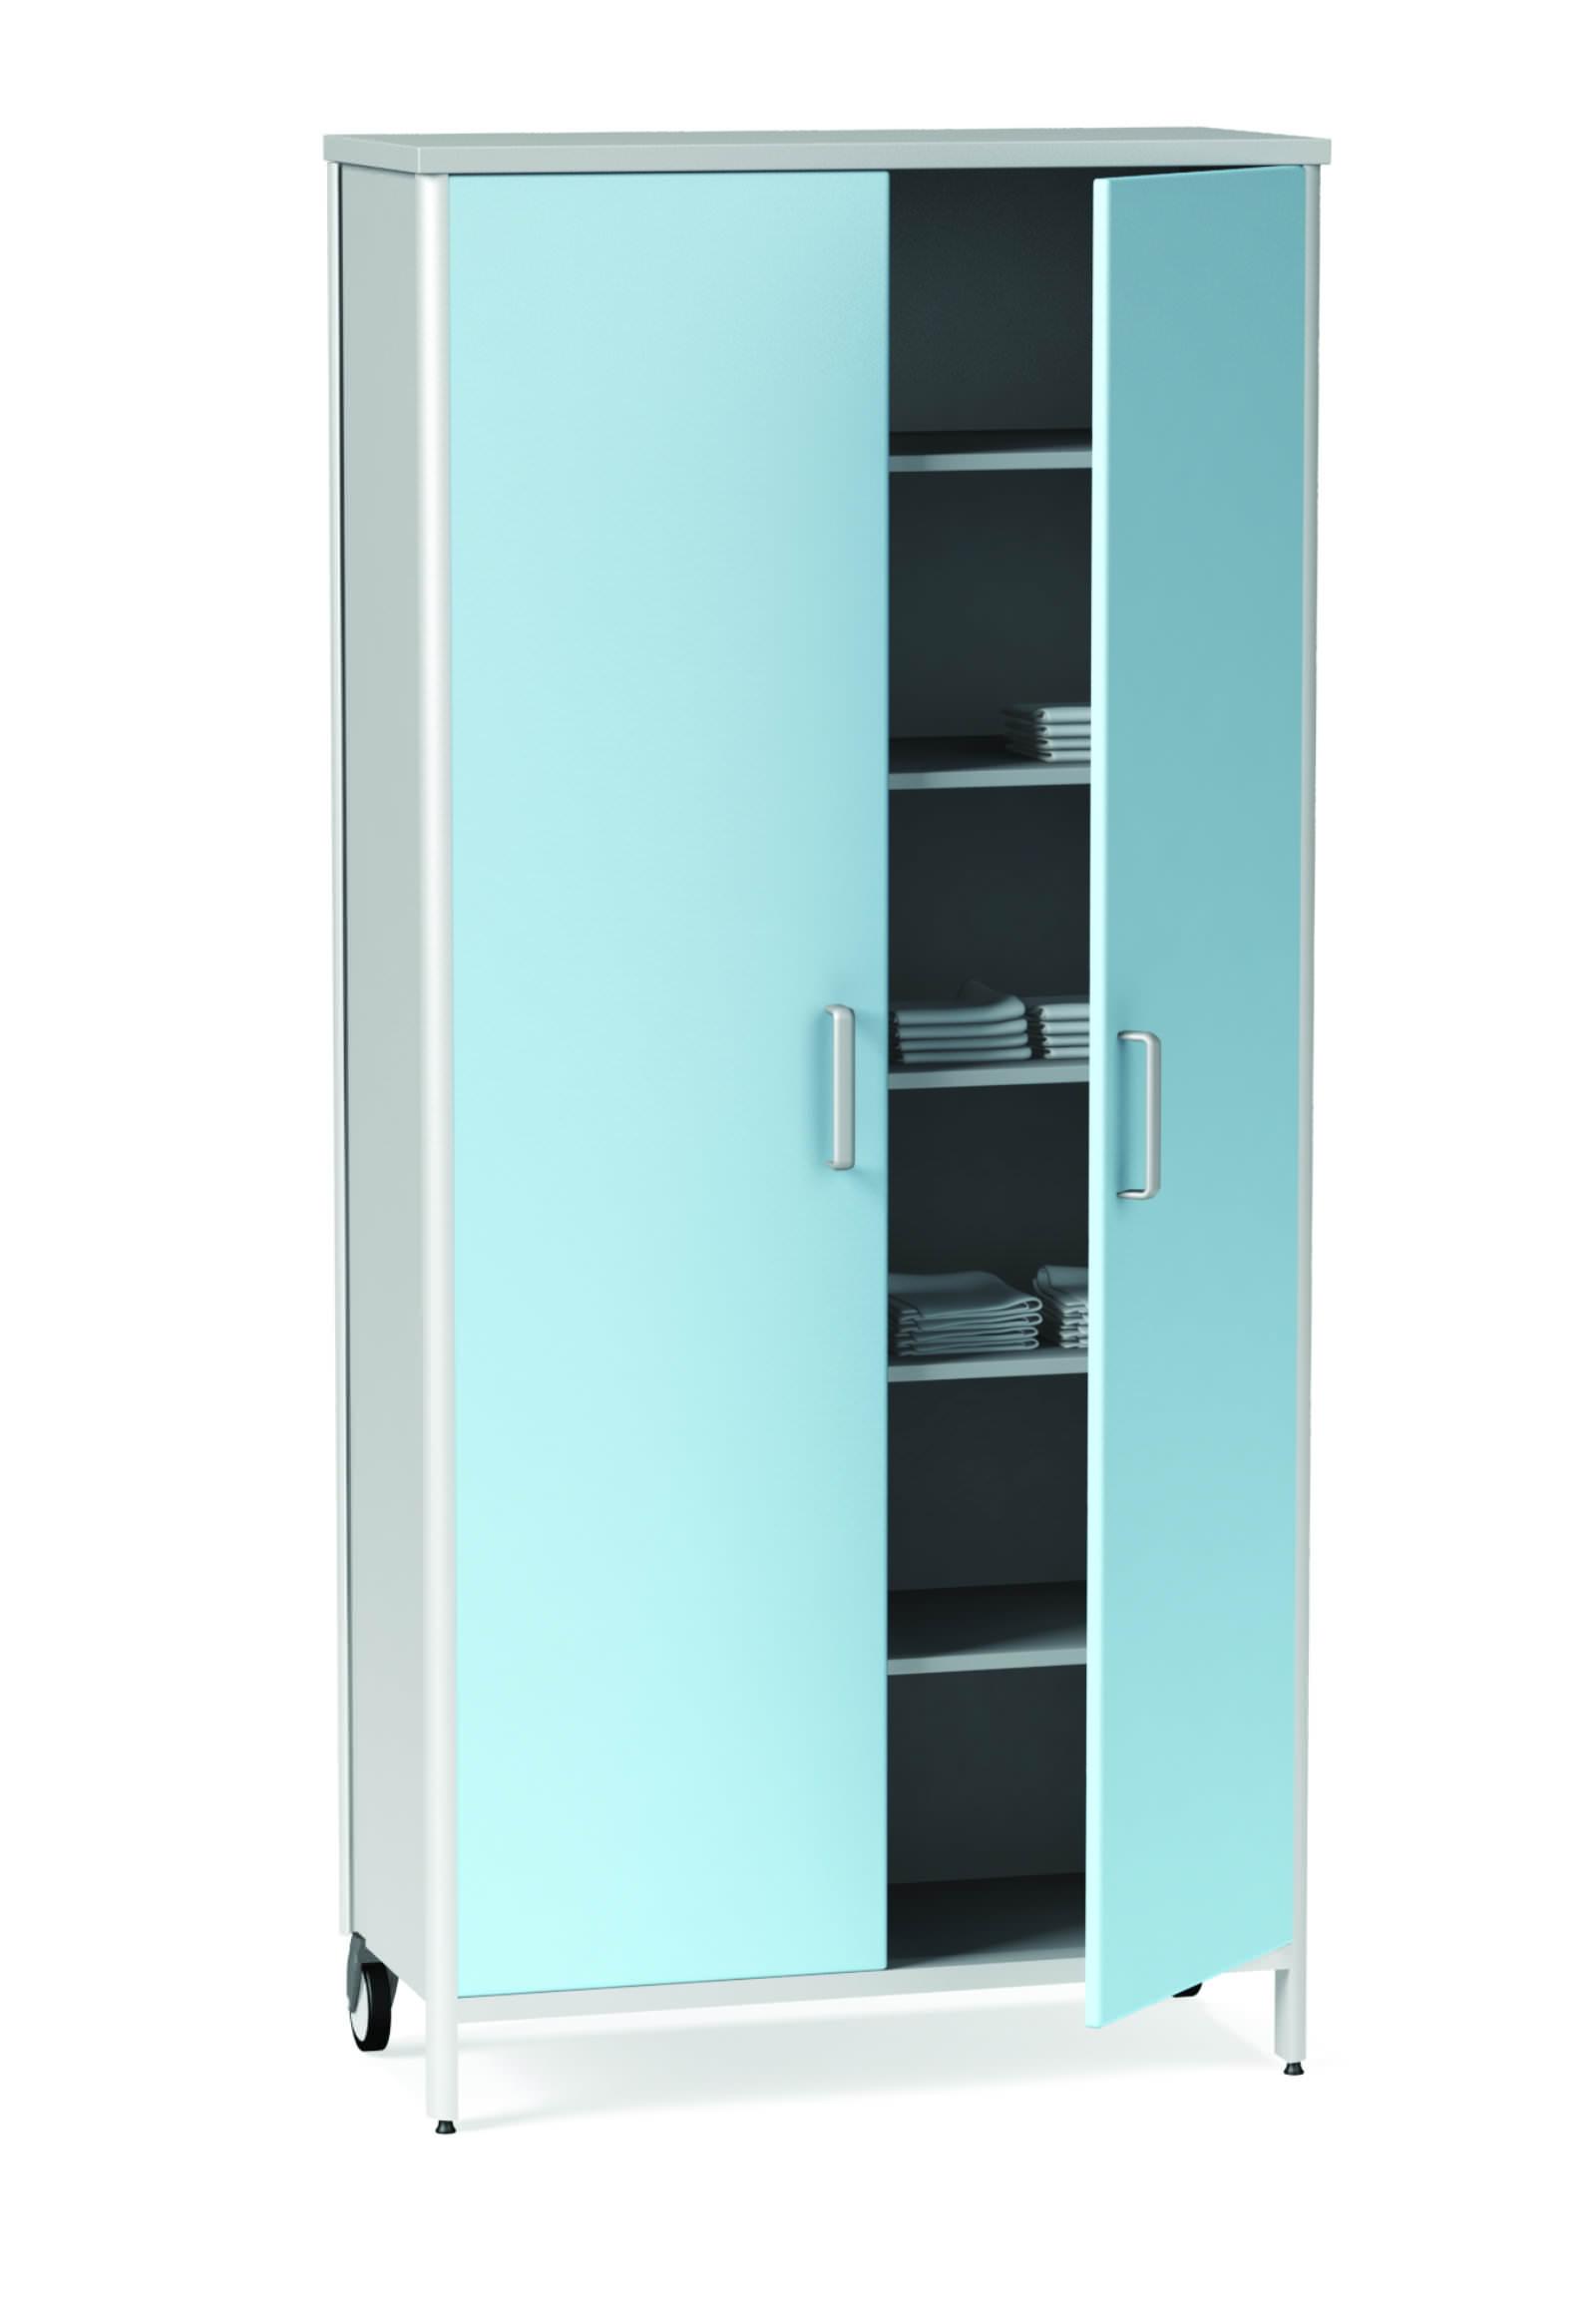 Медицинский шкаф ДМ-3-001-28, фото 2